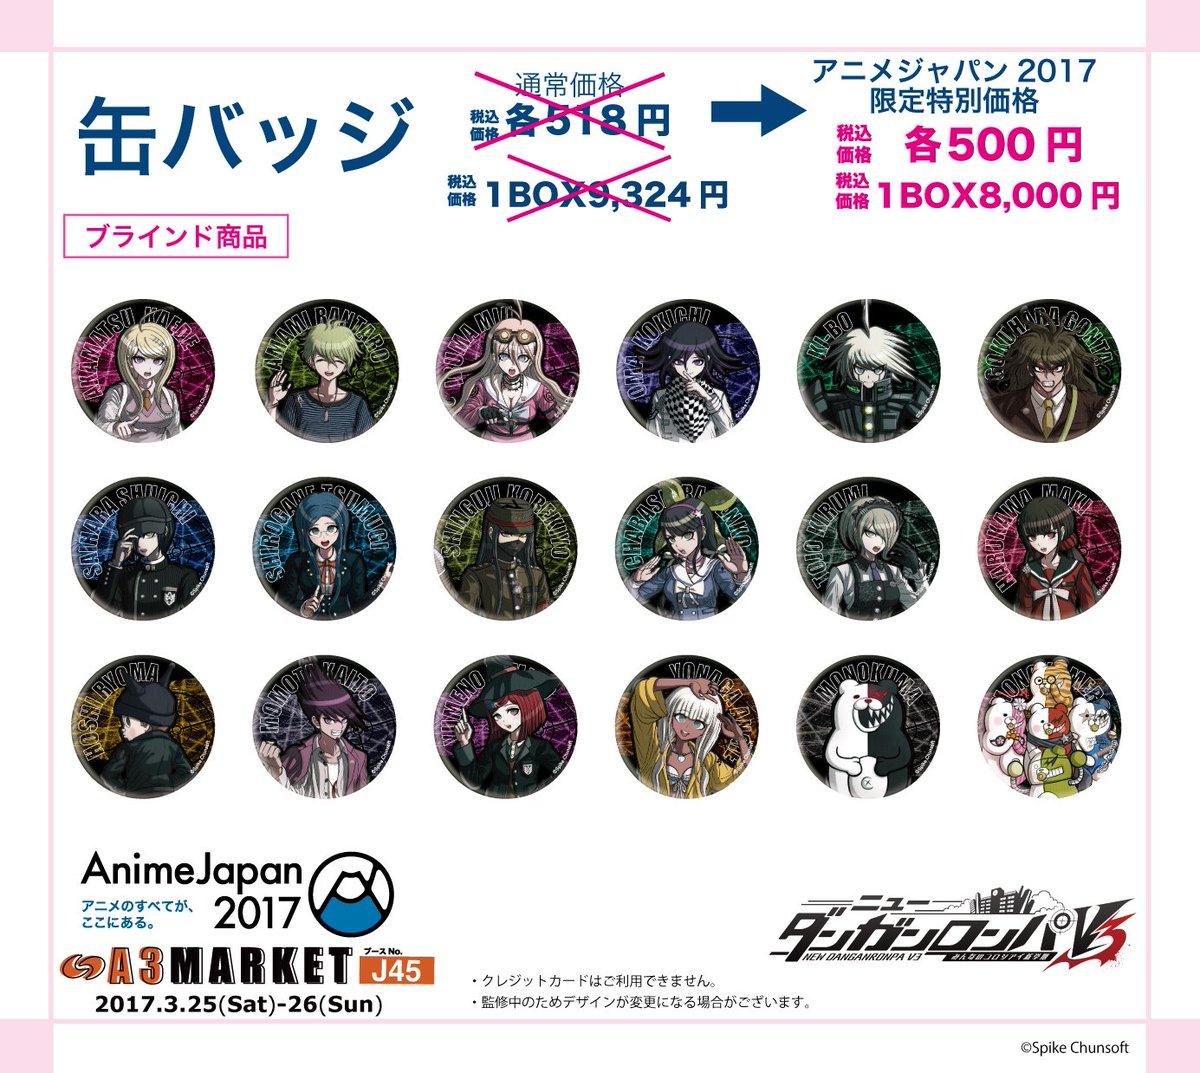 【A3MARKET AJ-J45】AnimeJapaneで「ニューダンガンロンパV3 みんなのコロシアイ新学期」の缶バッ